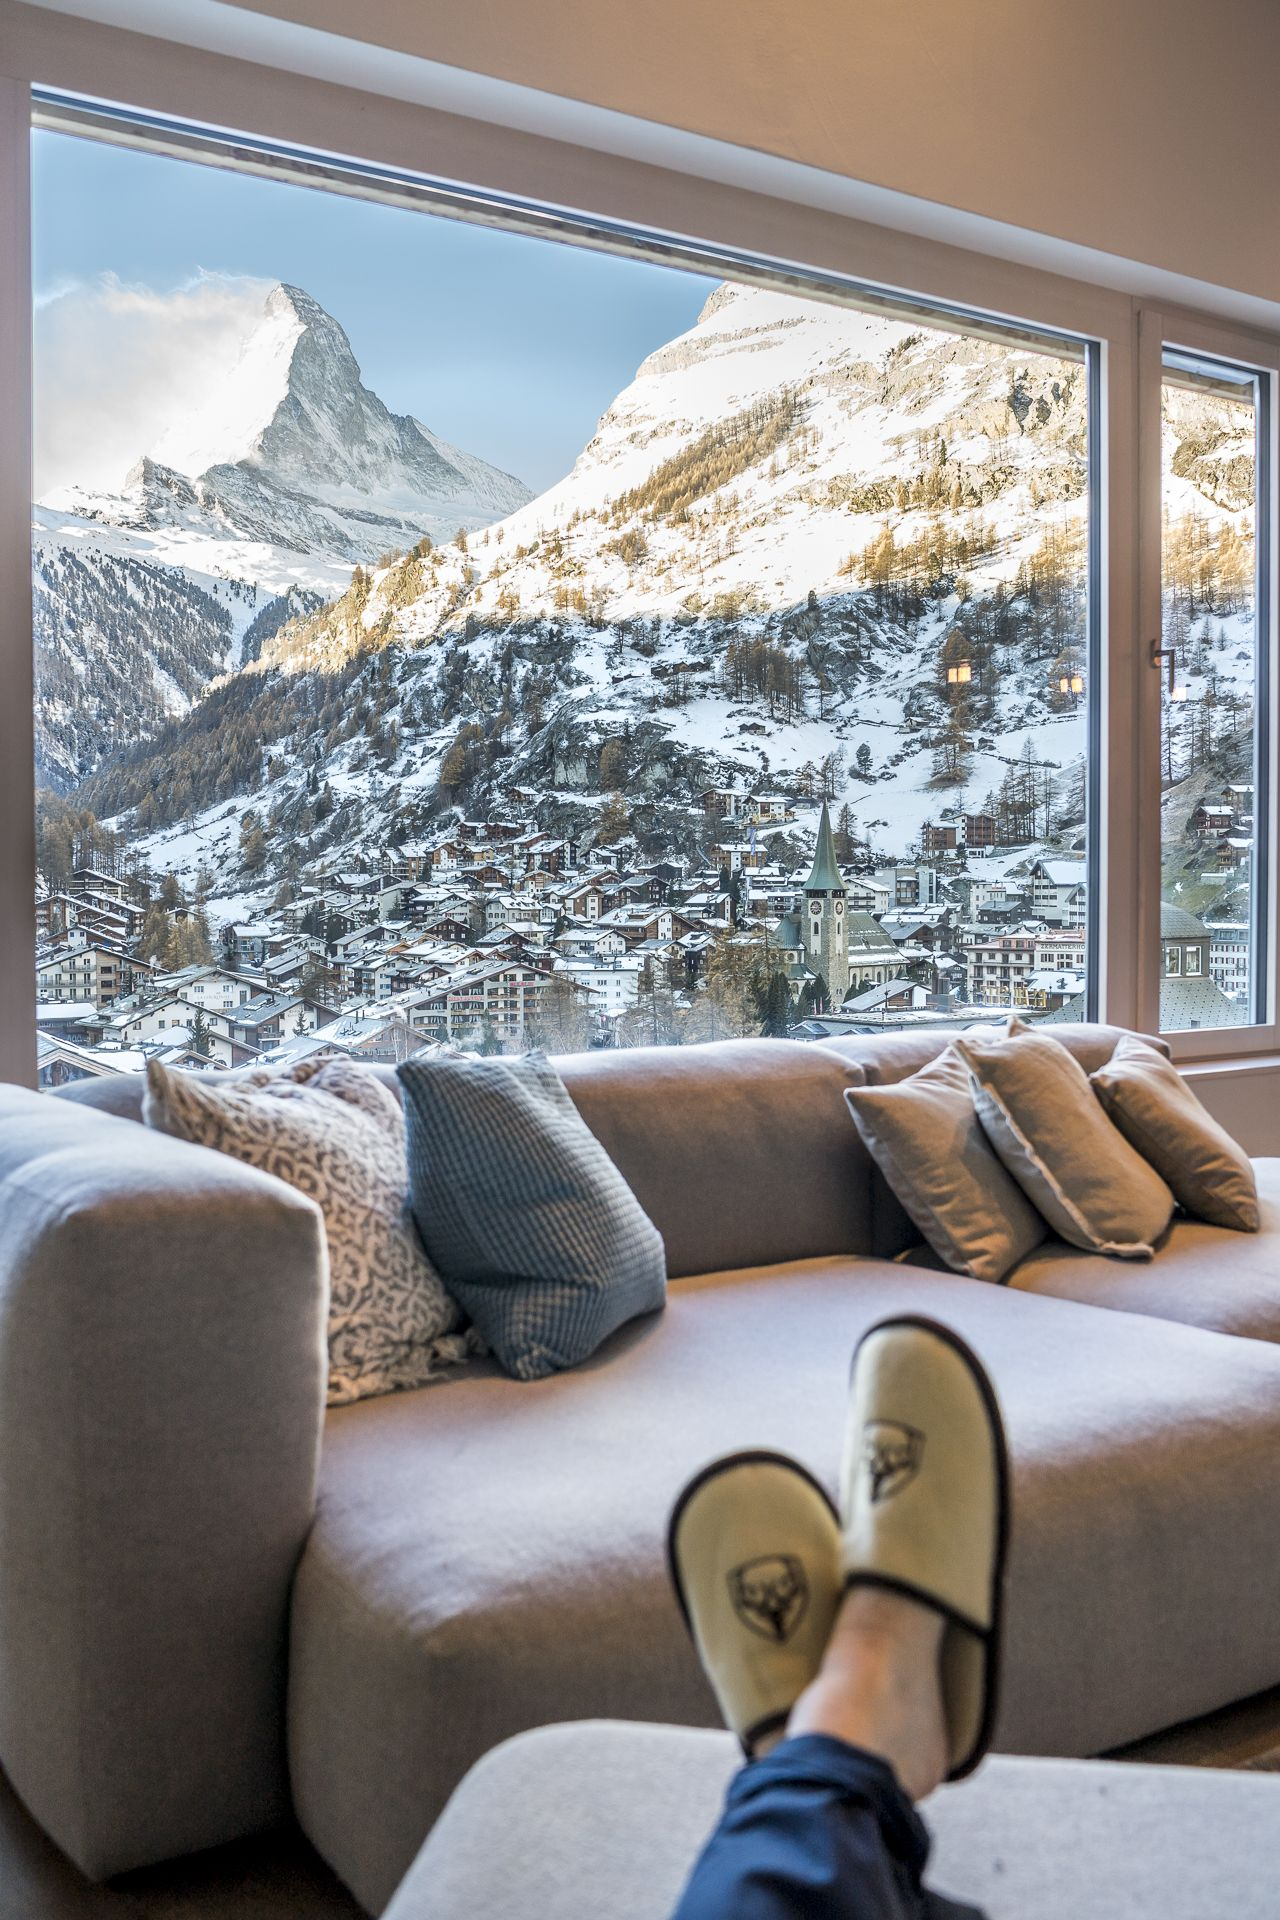 Chilling in the coolest lodge in Zermatt #travel #travelinspiration #travelphotography #nature #naturephotography #exploretheworld #bucketlist #view #mountainviews #luxuryliving